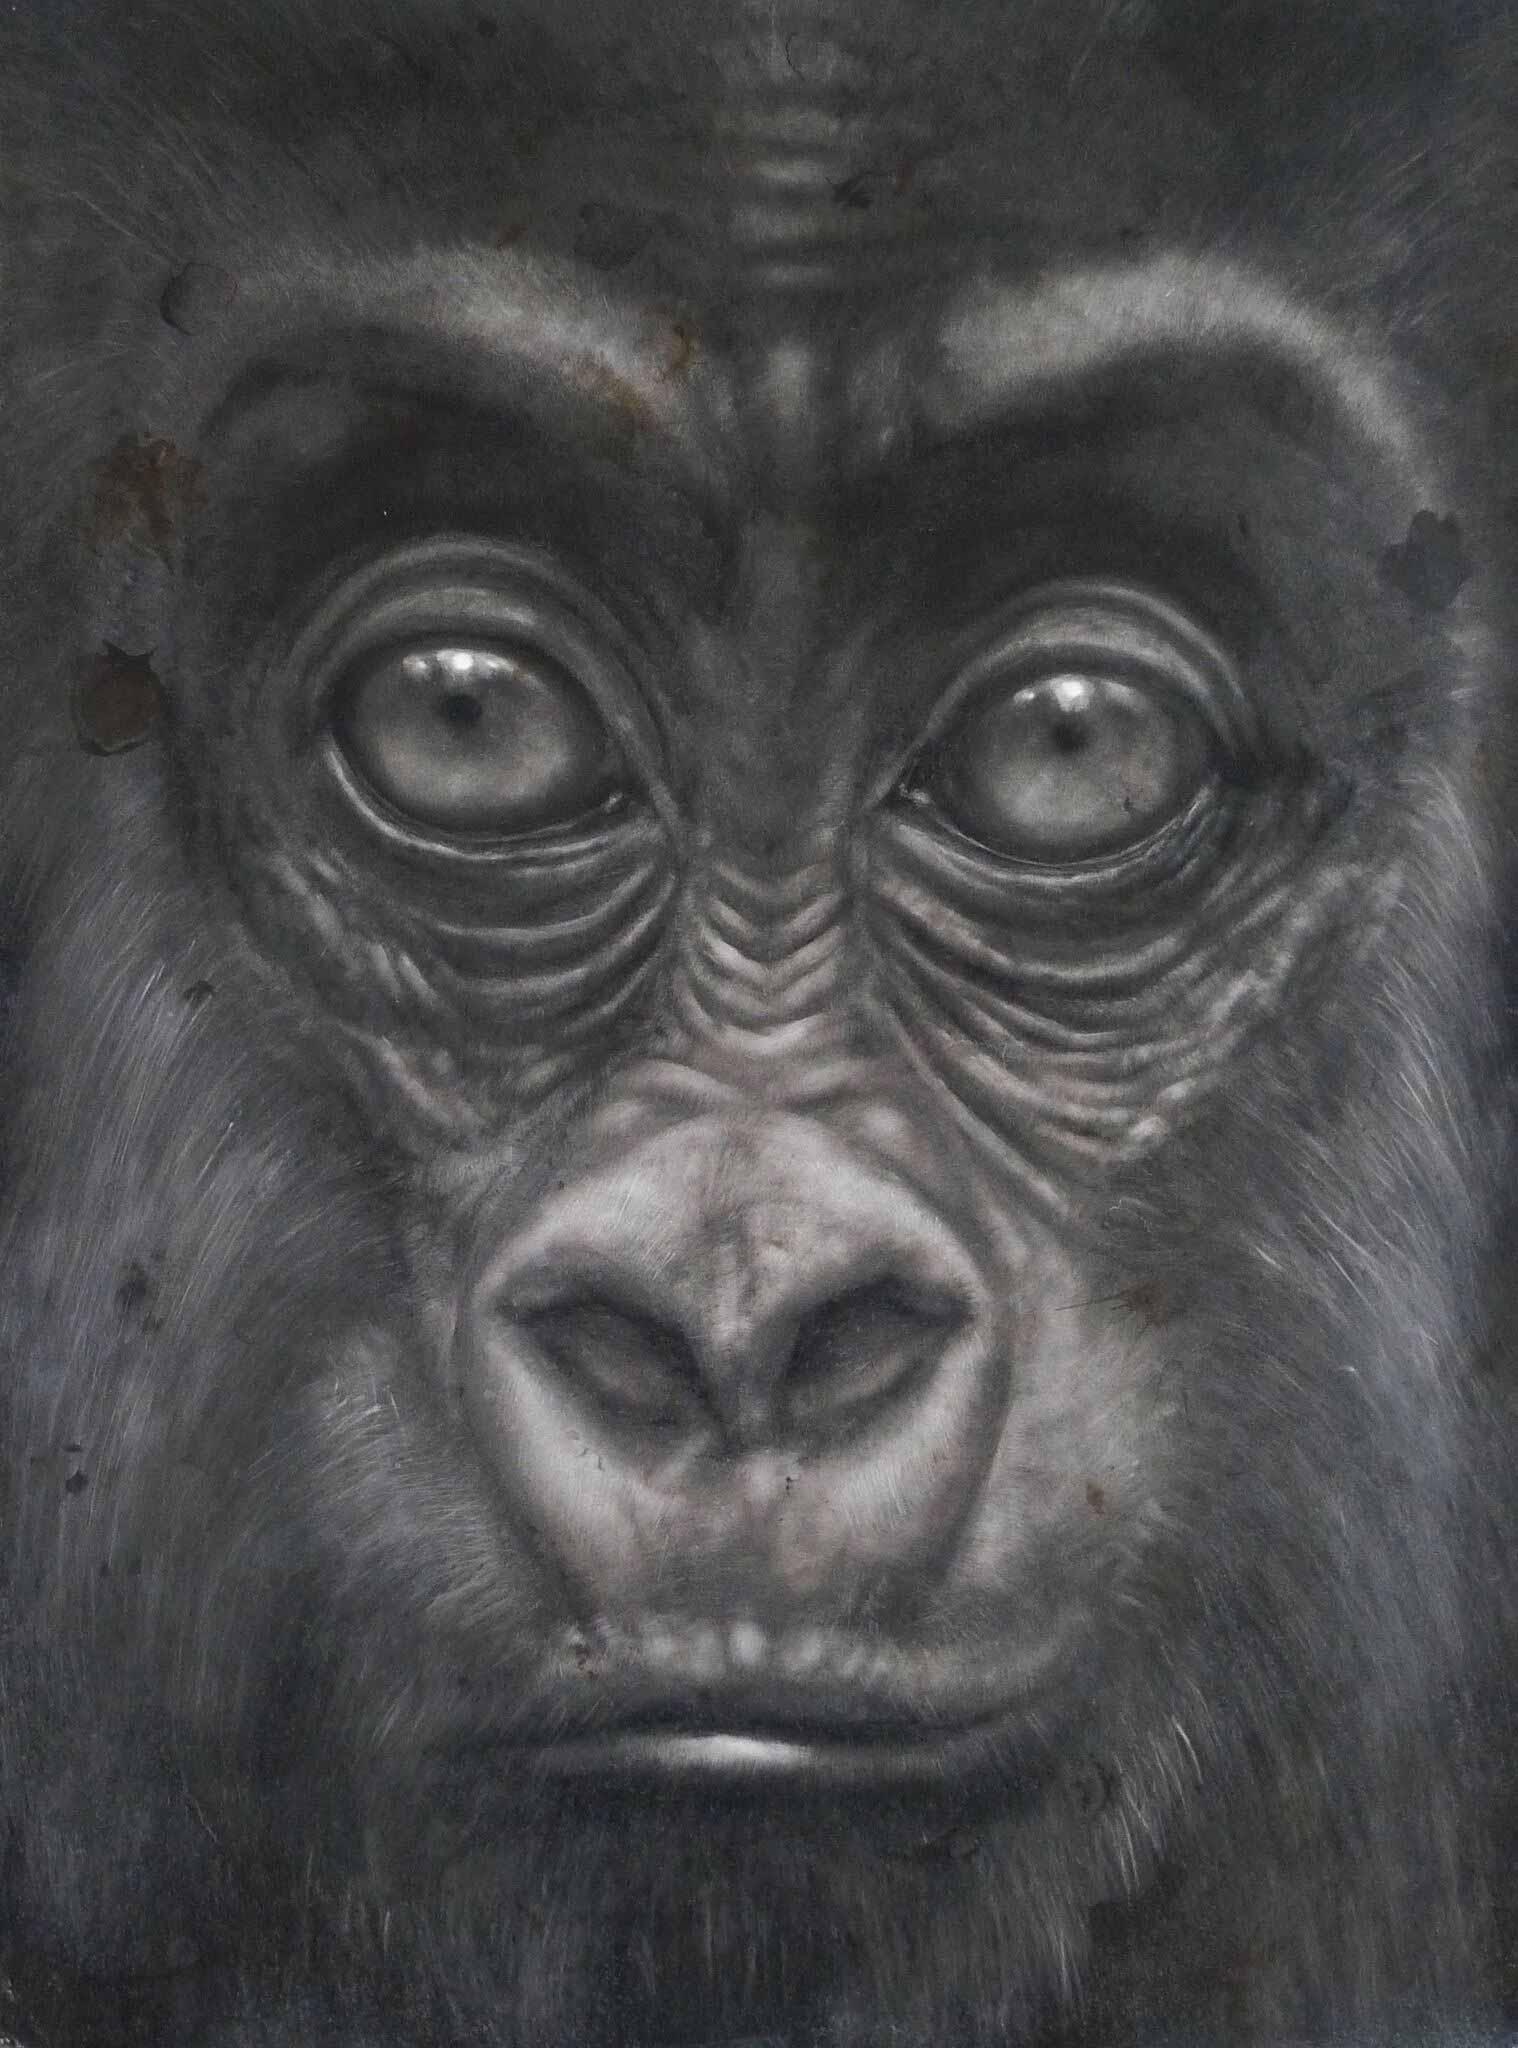 3-Drawn-JuanPerdiguero-SimiosRostros-2016